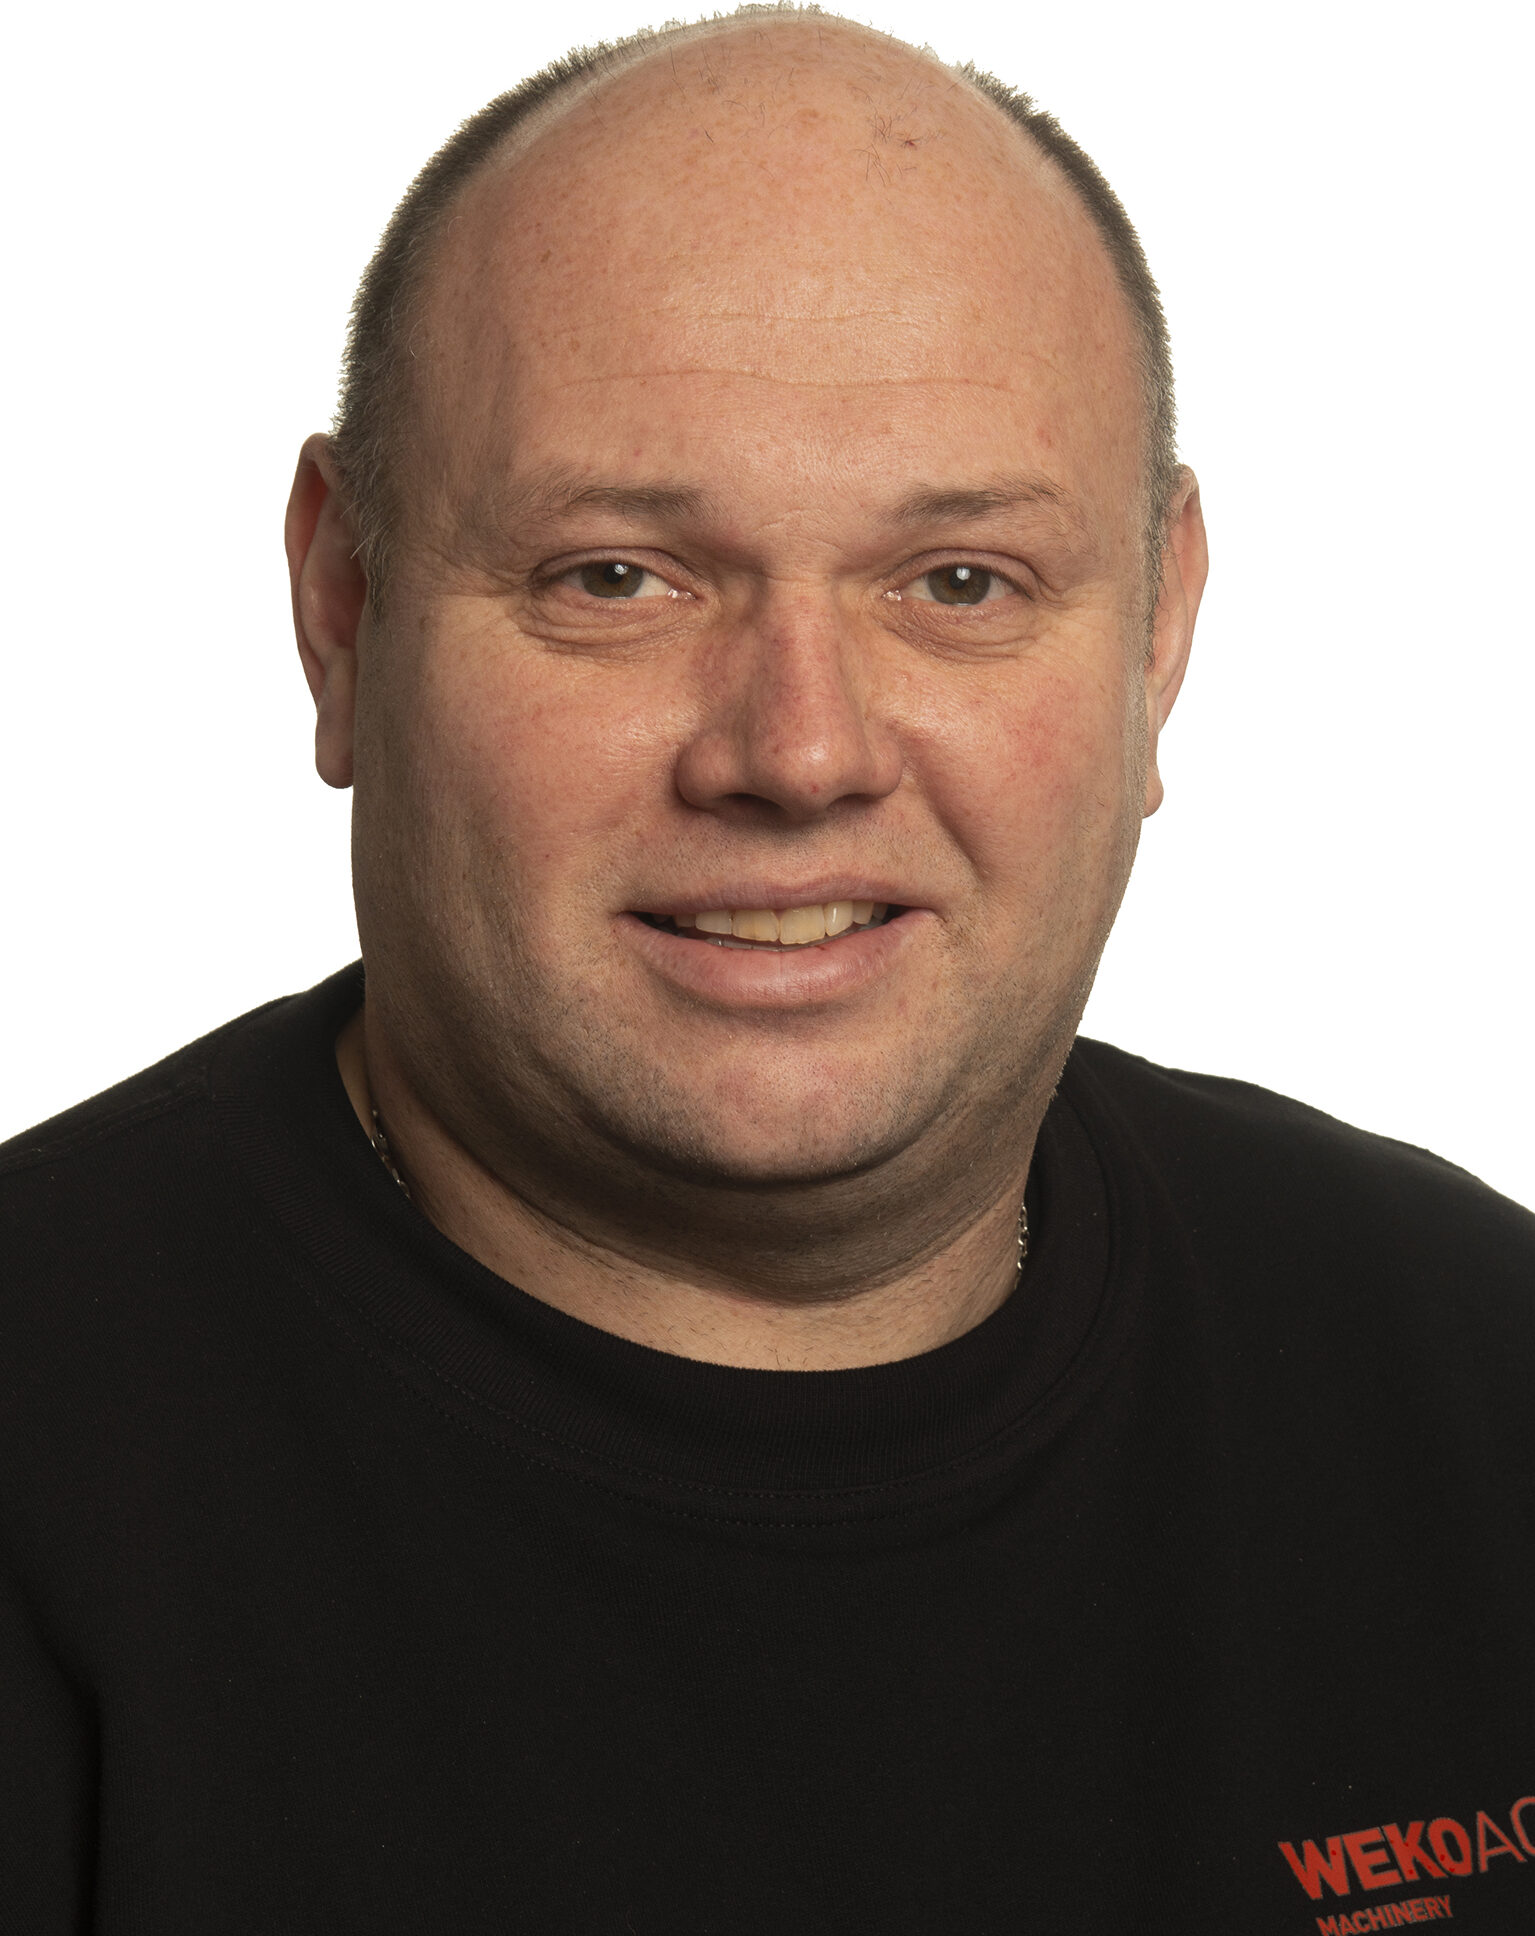 Karsten Fogtmann Jensen